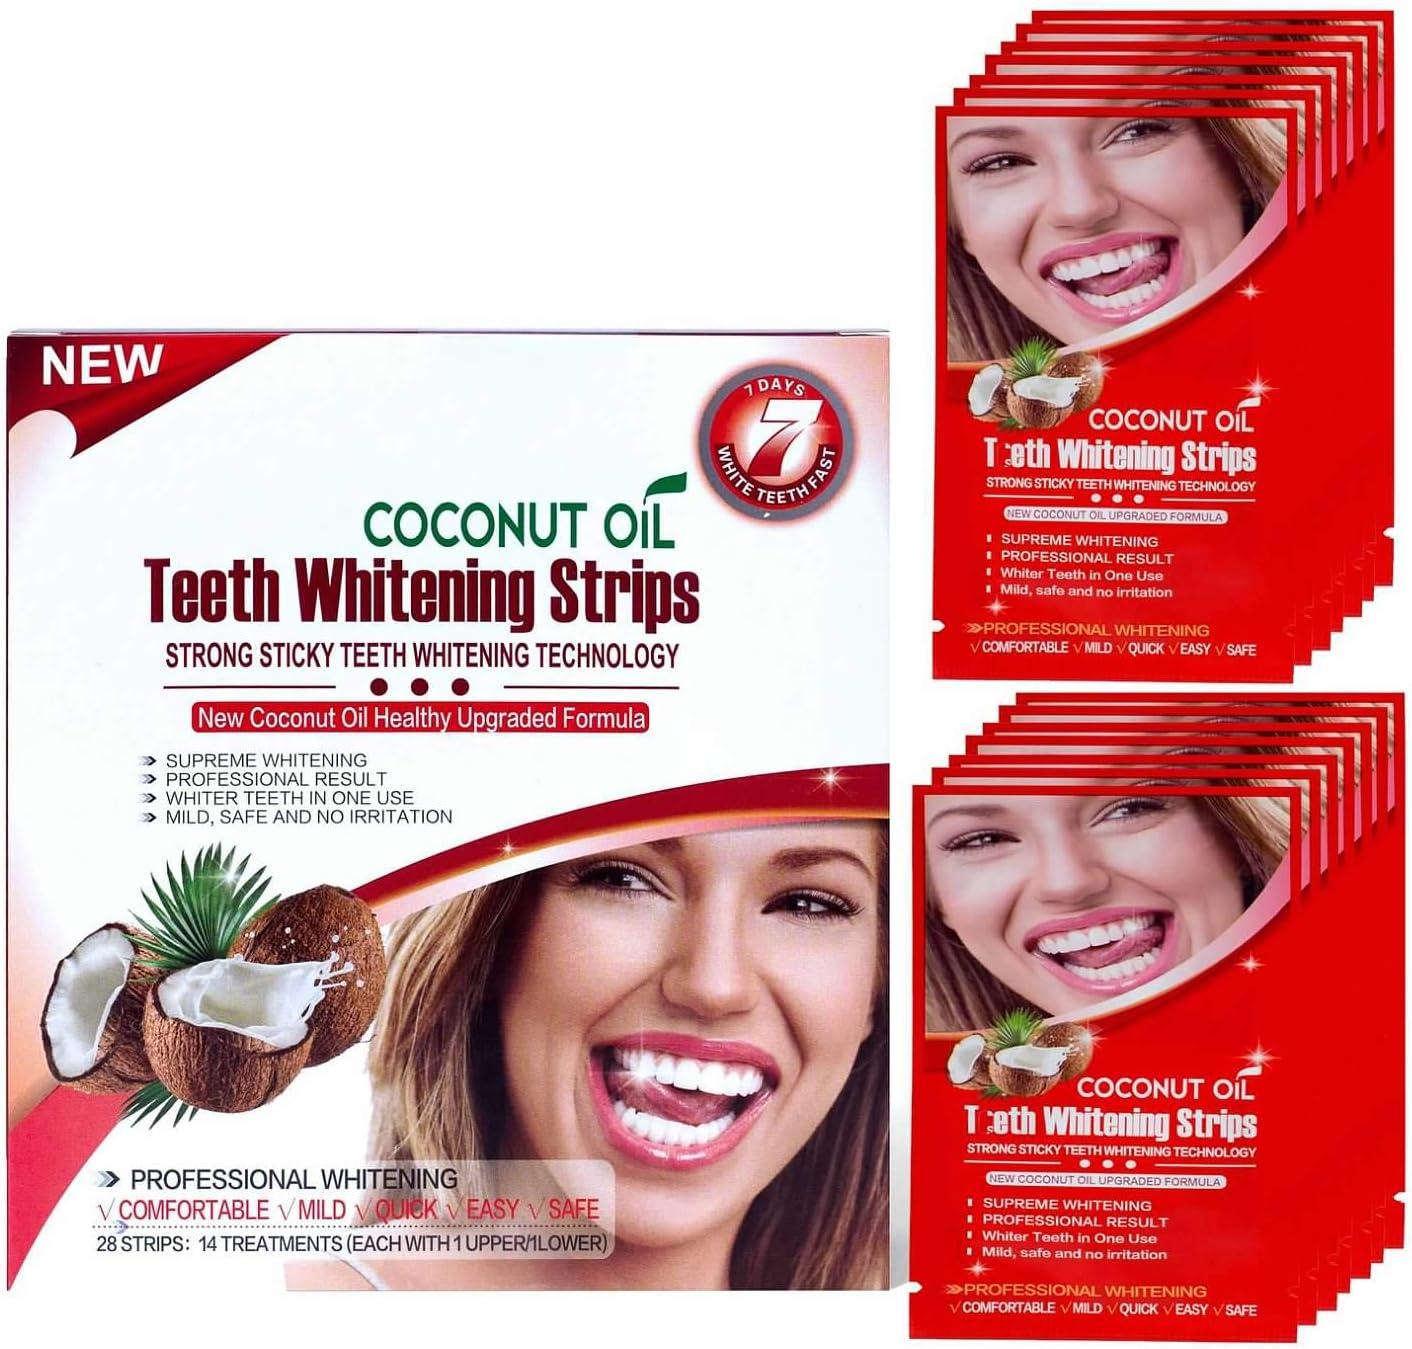 Senyum Teeth Whitening Strips 14 Treatments Dentist for Sensitive Teeth, Whitener Strips (14 for Upper 14 for Lower): Health & Personal Care